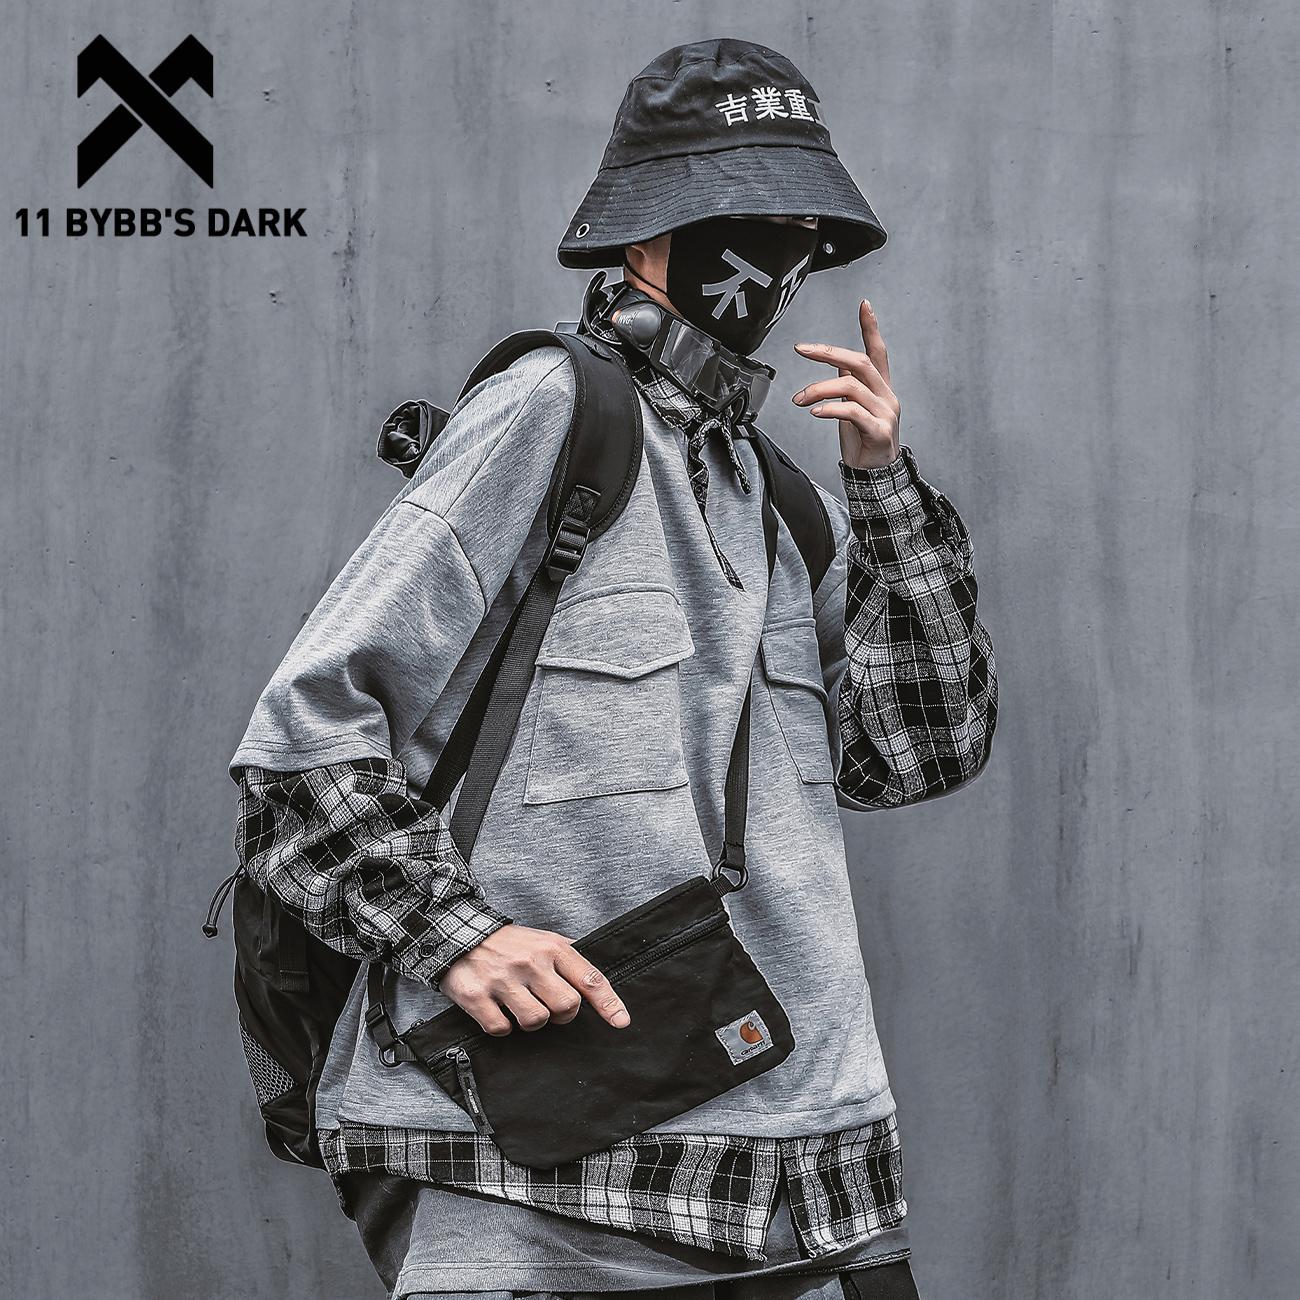 11 BYBB'S DARK-كنزة بغطاء للرأس للرجال ، منقوشة ، مرقعة ، هيب هوب ، ملابس الشارع ، قطن ، ربيع ، Harajuku ، 2021